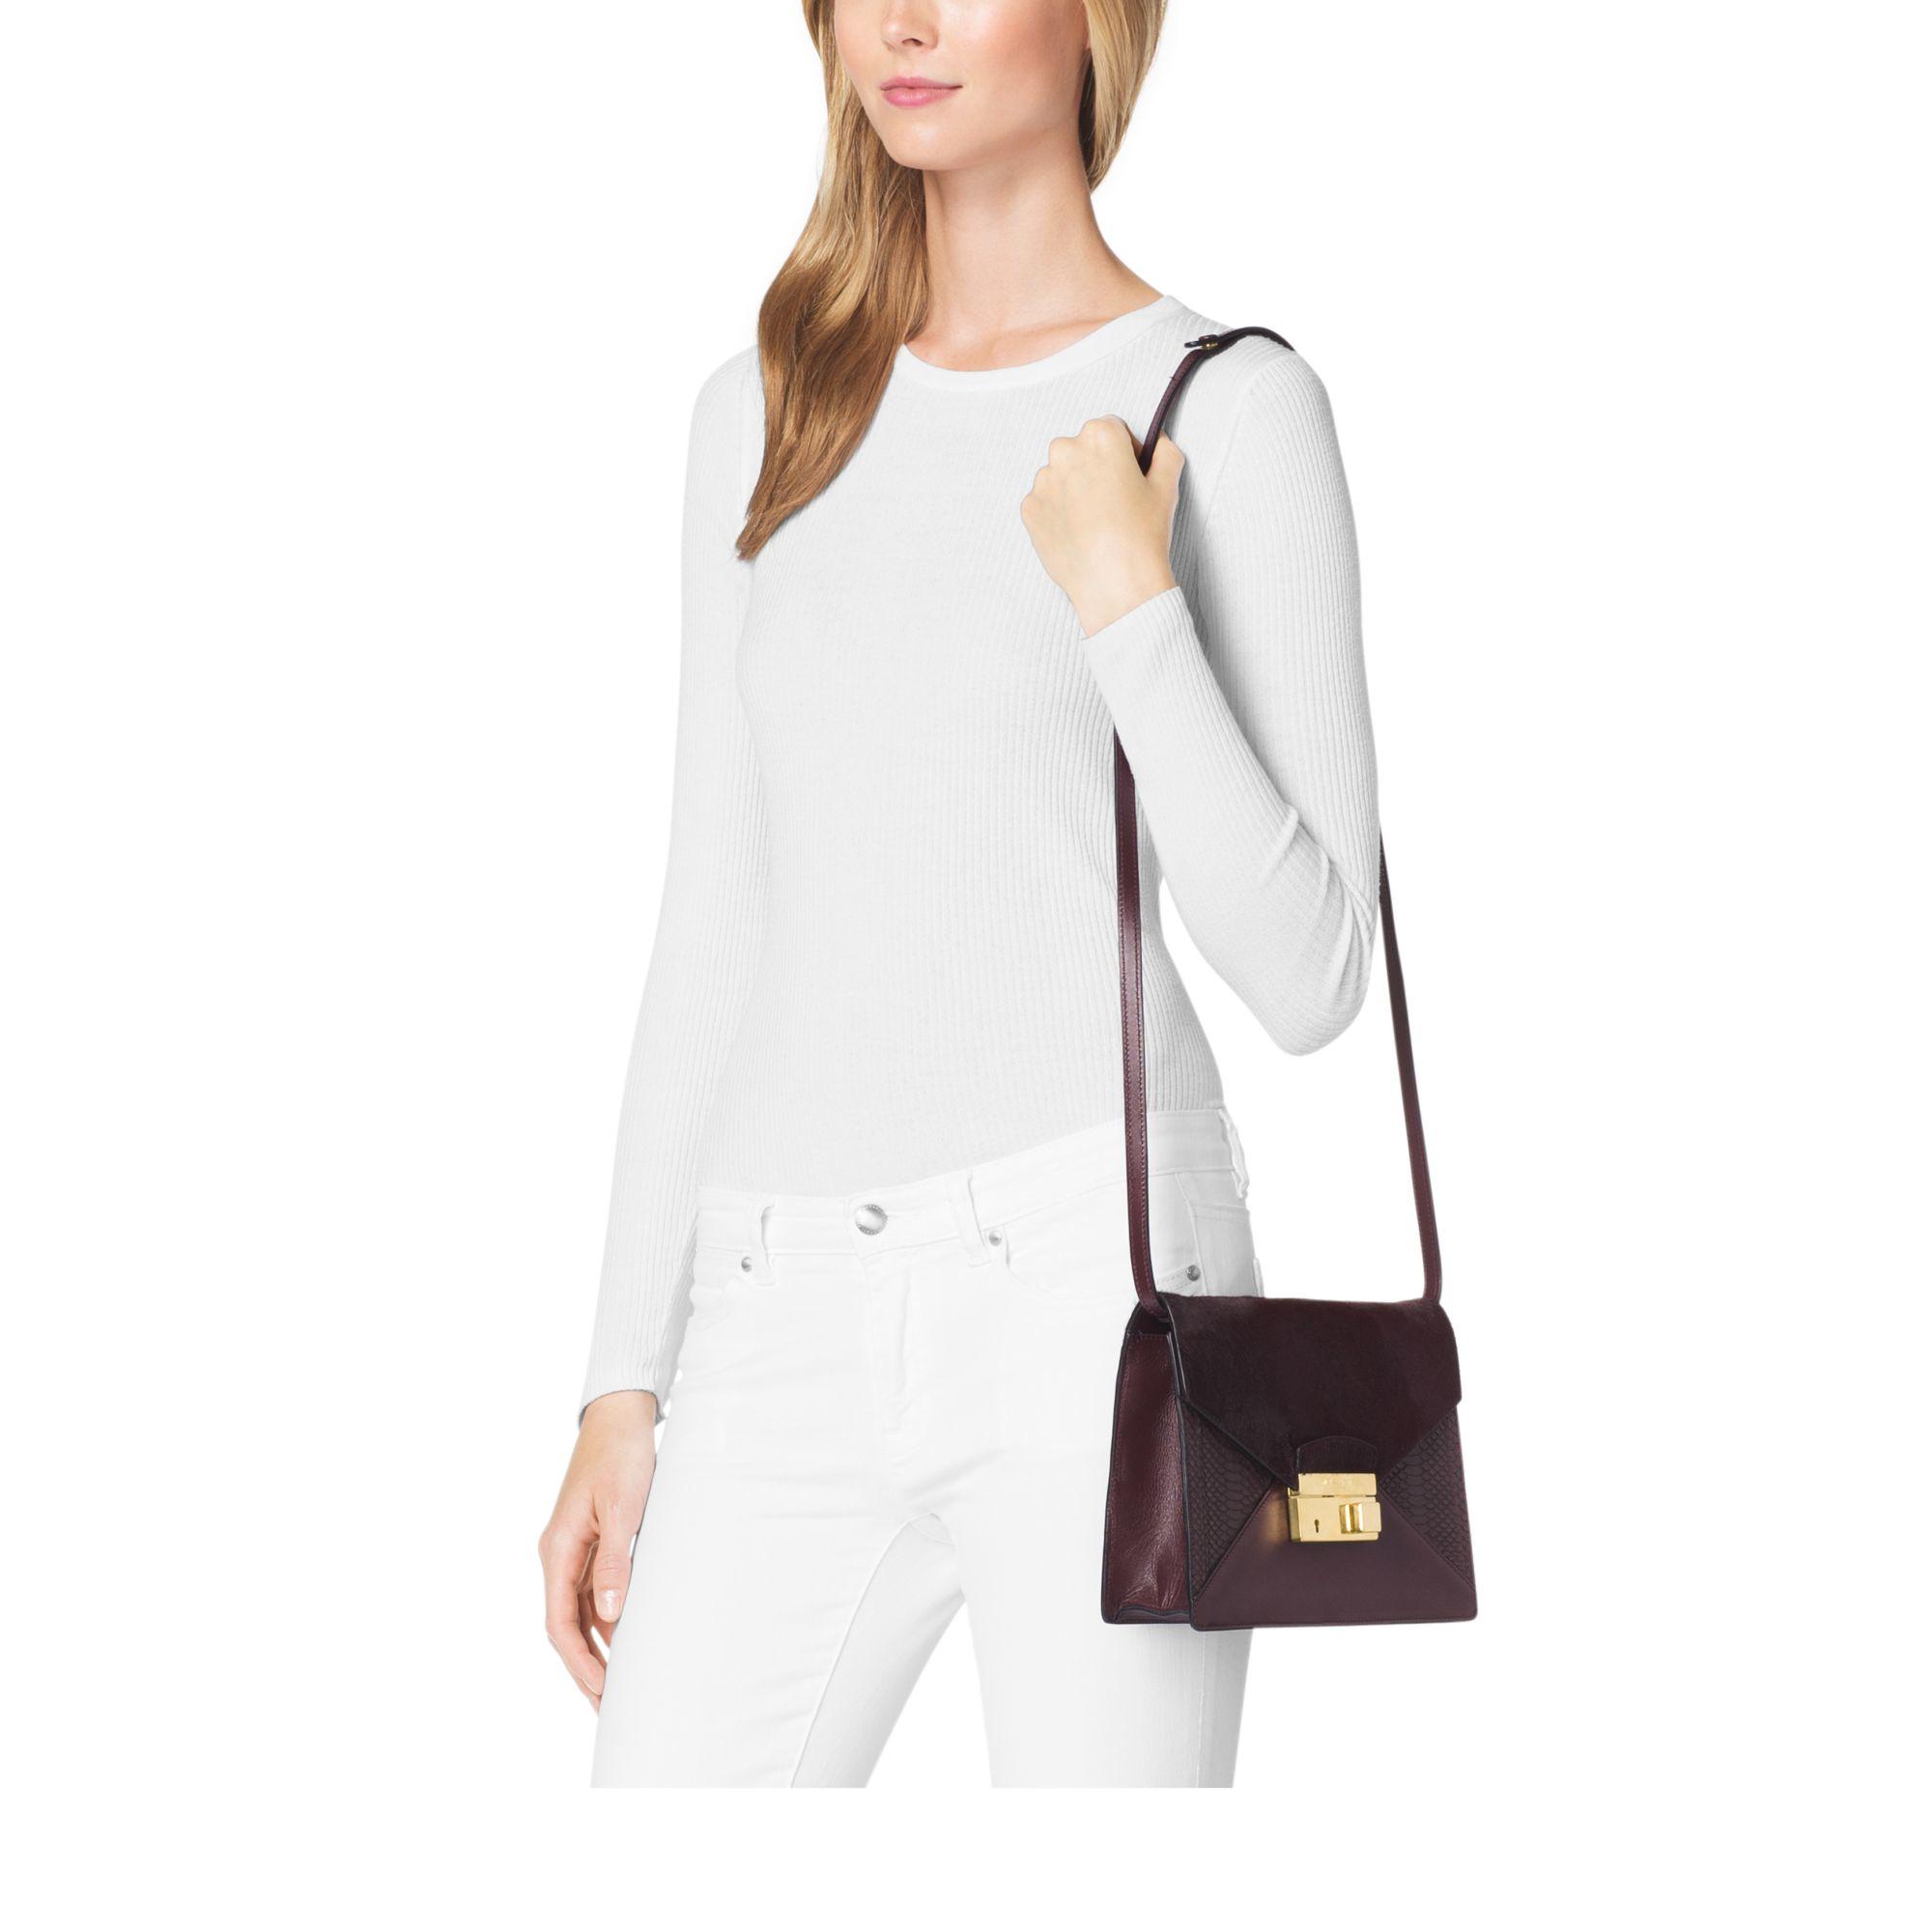 591f4bf6948 Lyst - Michael Kors Gia Medium Calf Hair And Python Shoulder Bag in ...